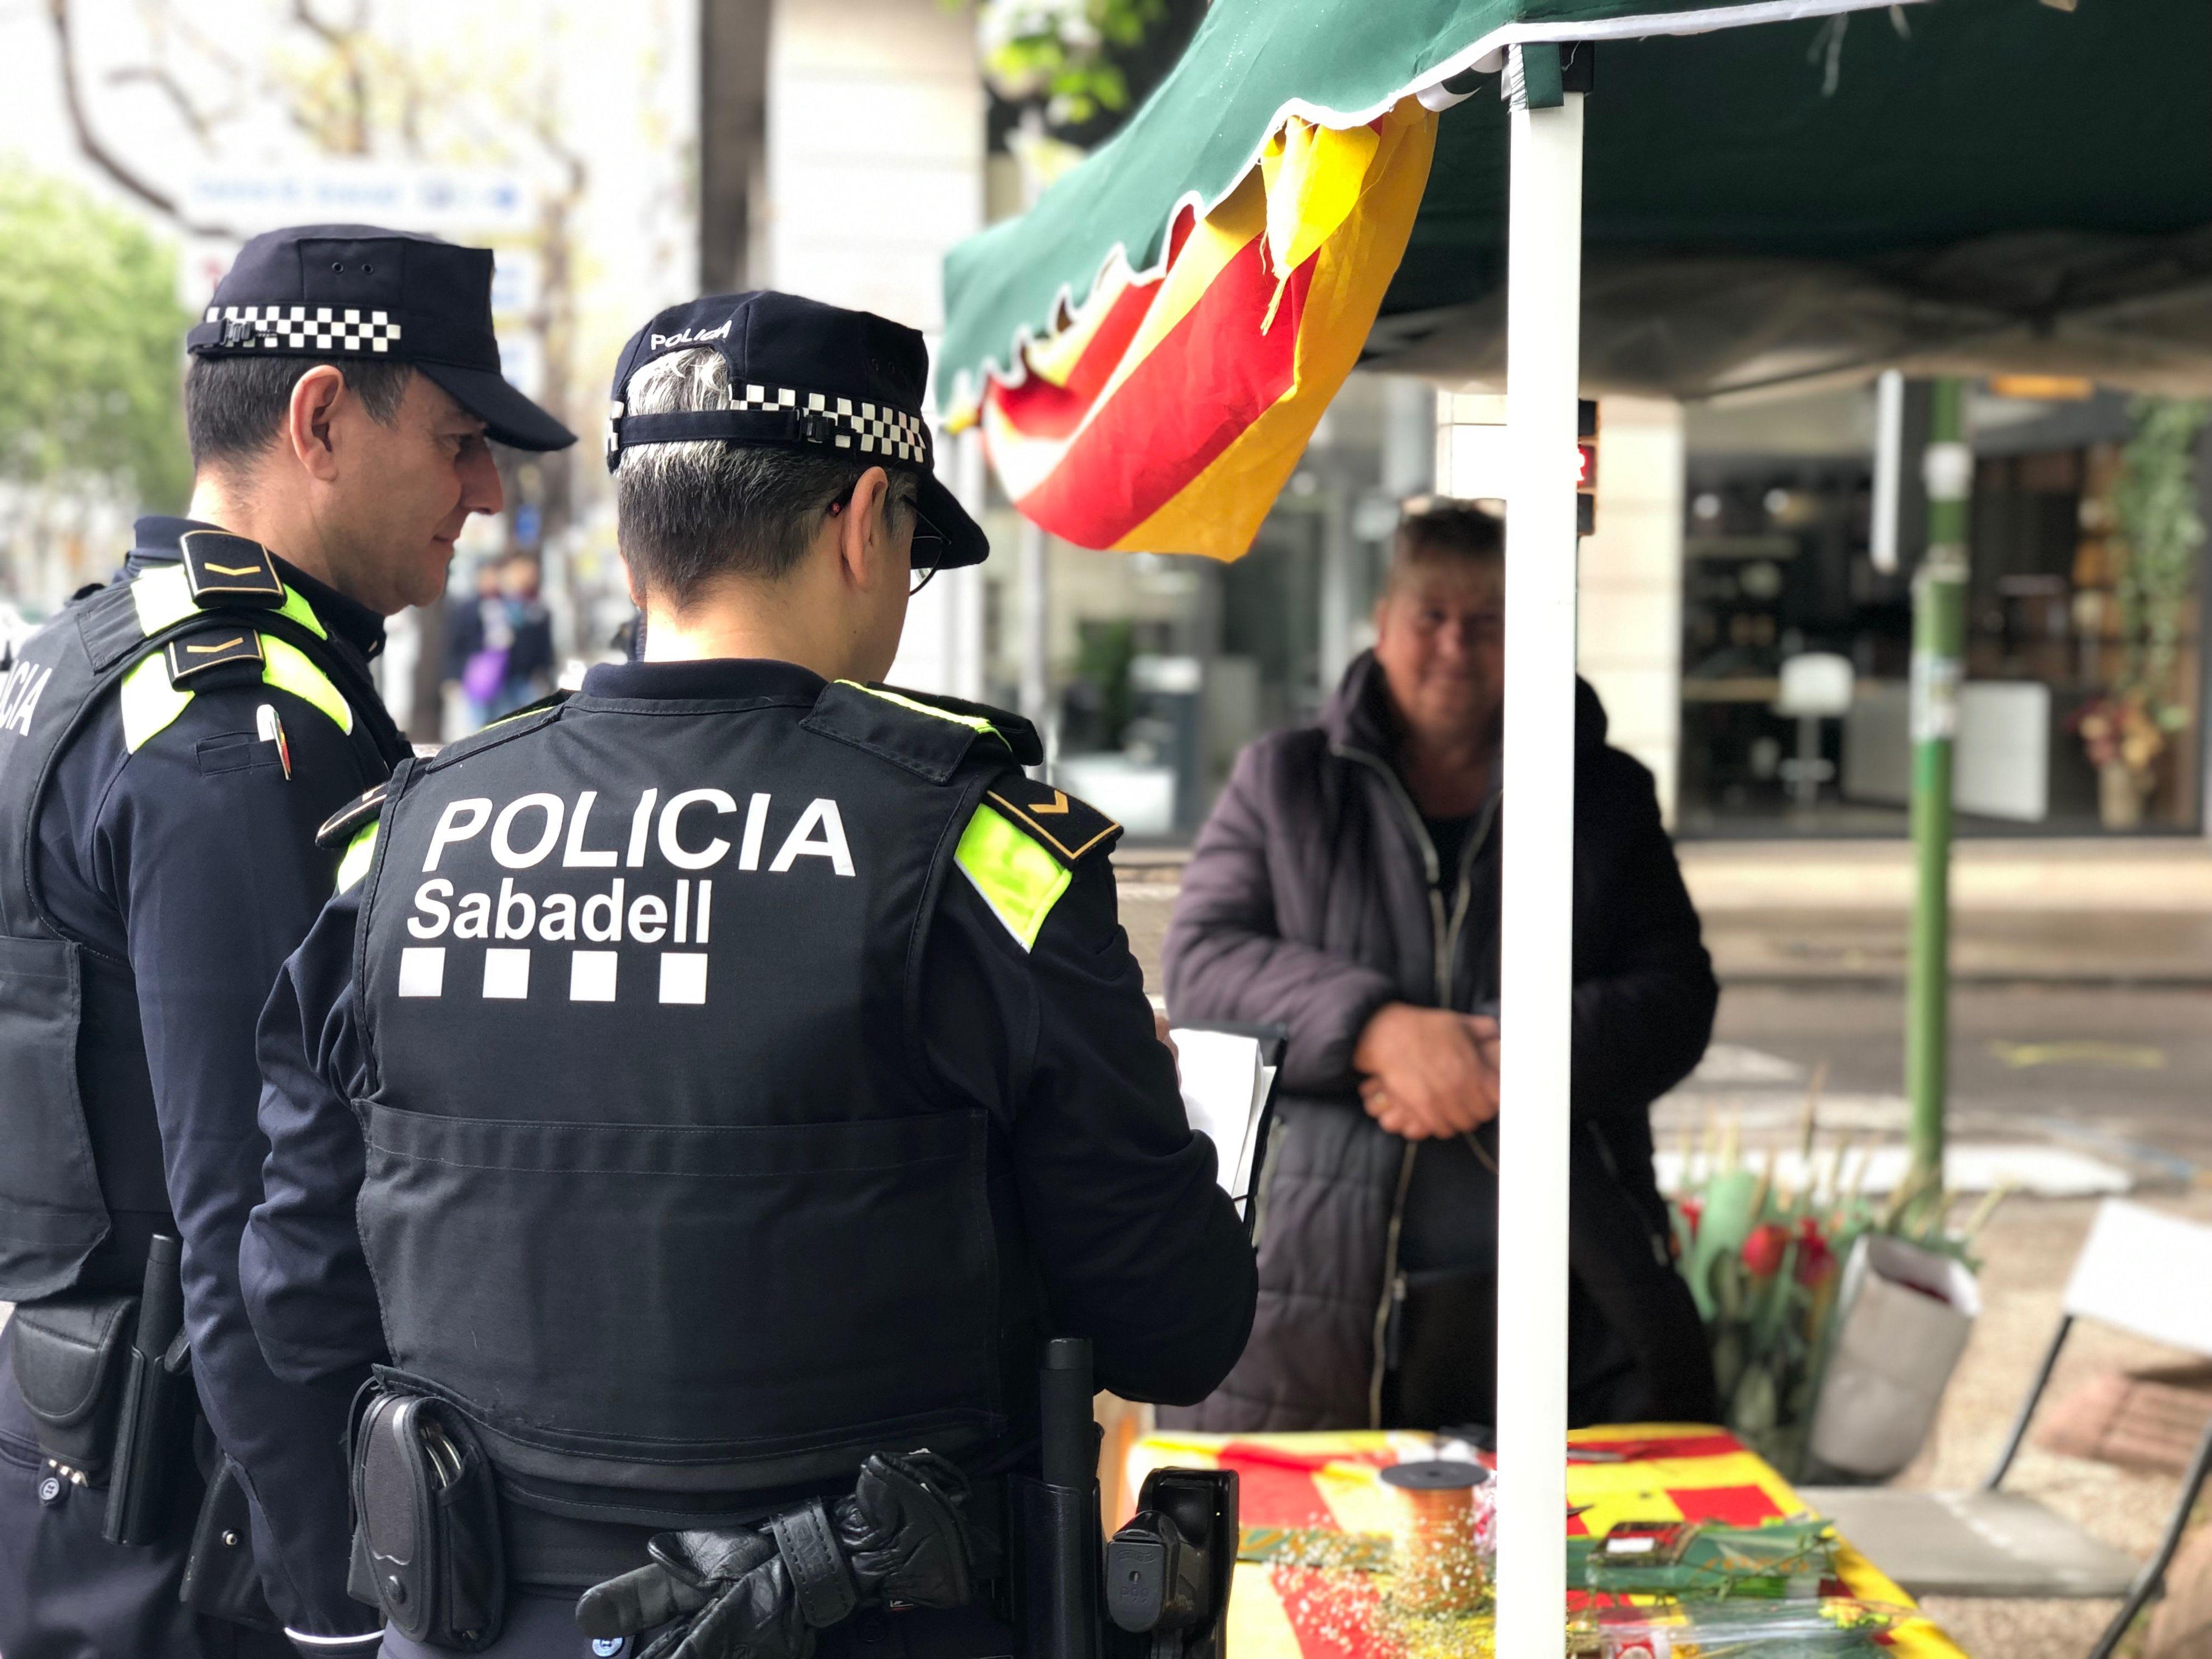 Curs Policia Local Sabadell 2021